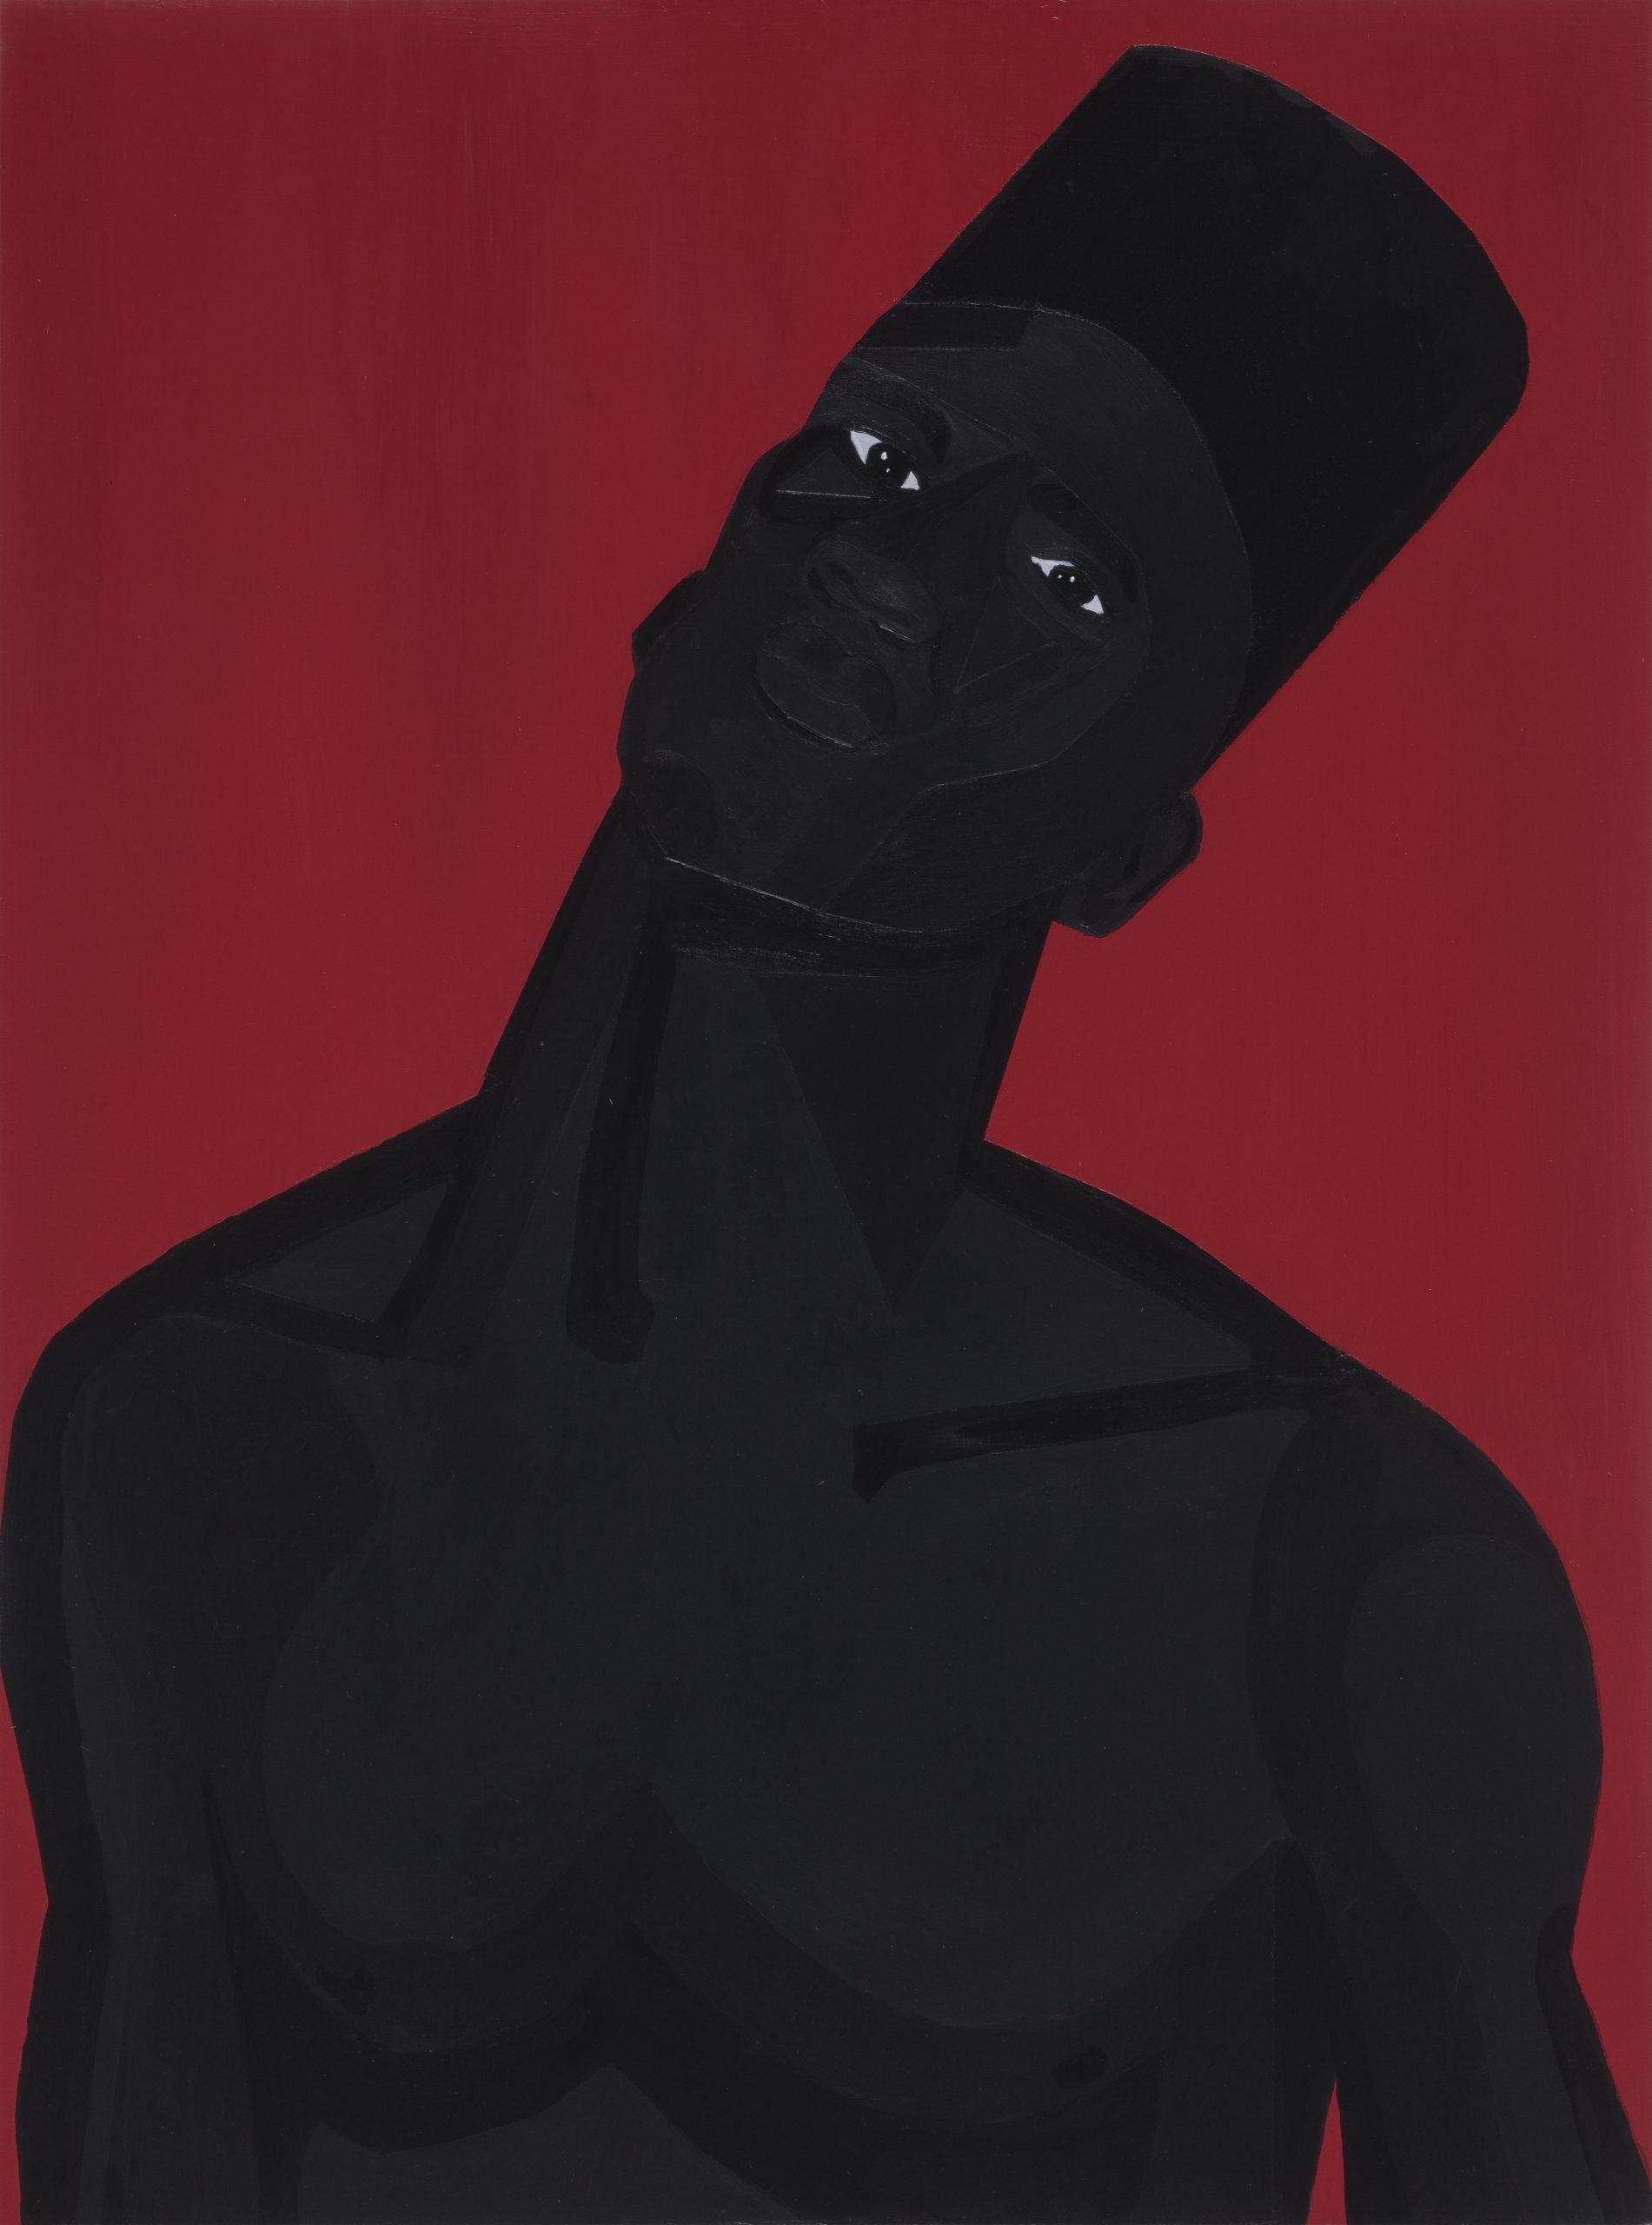 Jon Key. <em>The Man No. 8</em>, 2020. Acrylic on panel, 24 x 18 inches (61 x 45.7 cm)